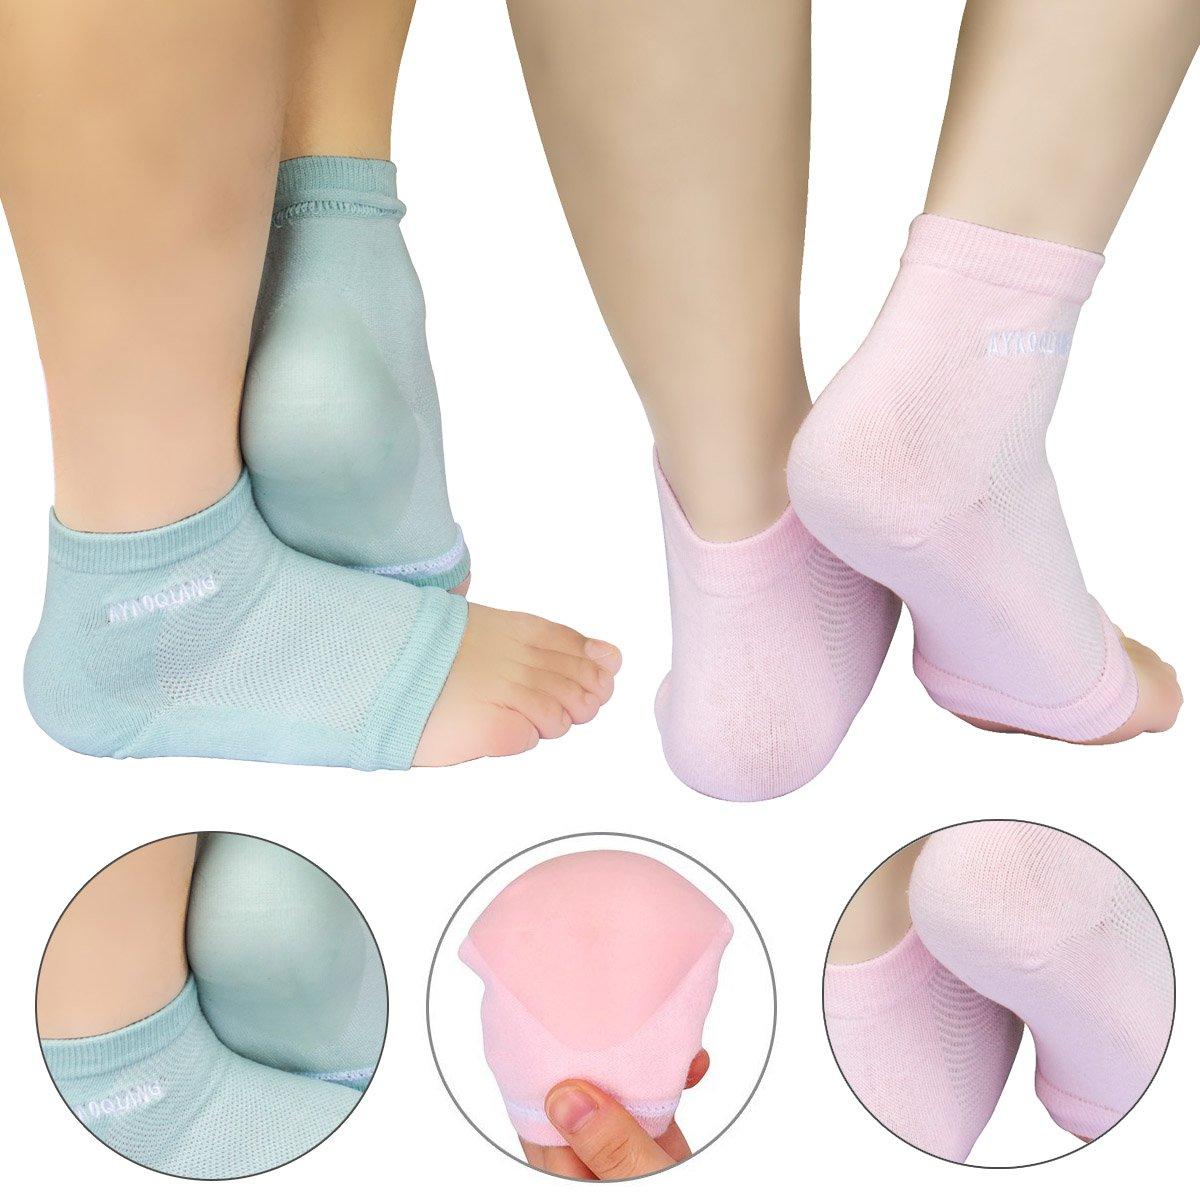 Amazon.com : Urea 40 % Percent Cream/Gel for Hands, Feet, Elbows and ...